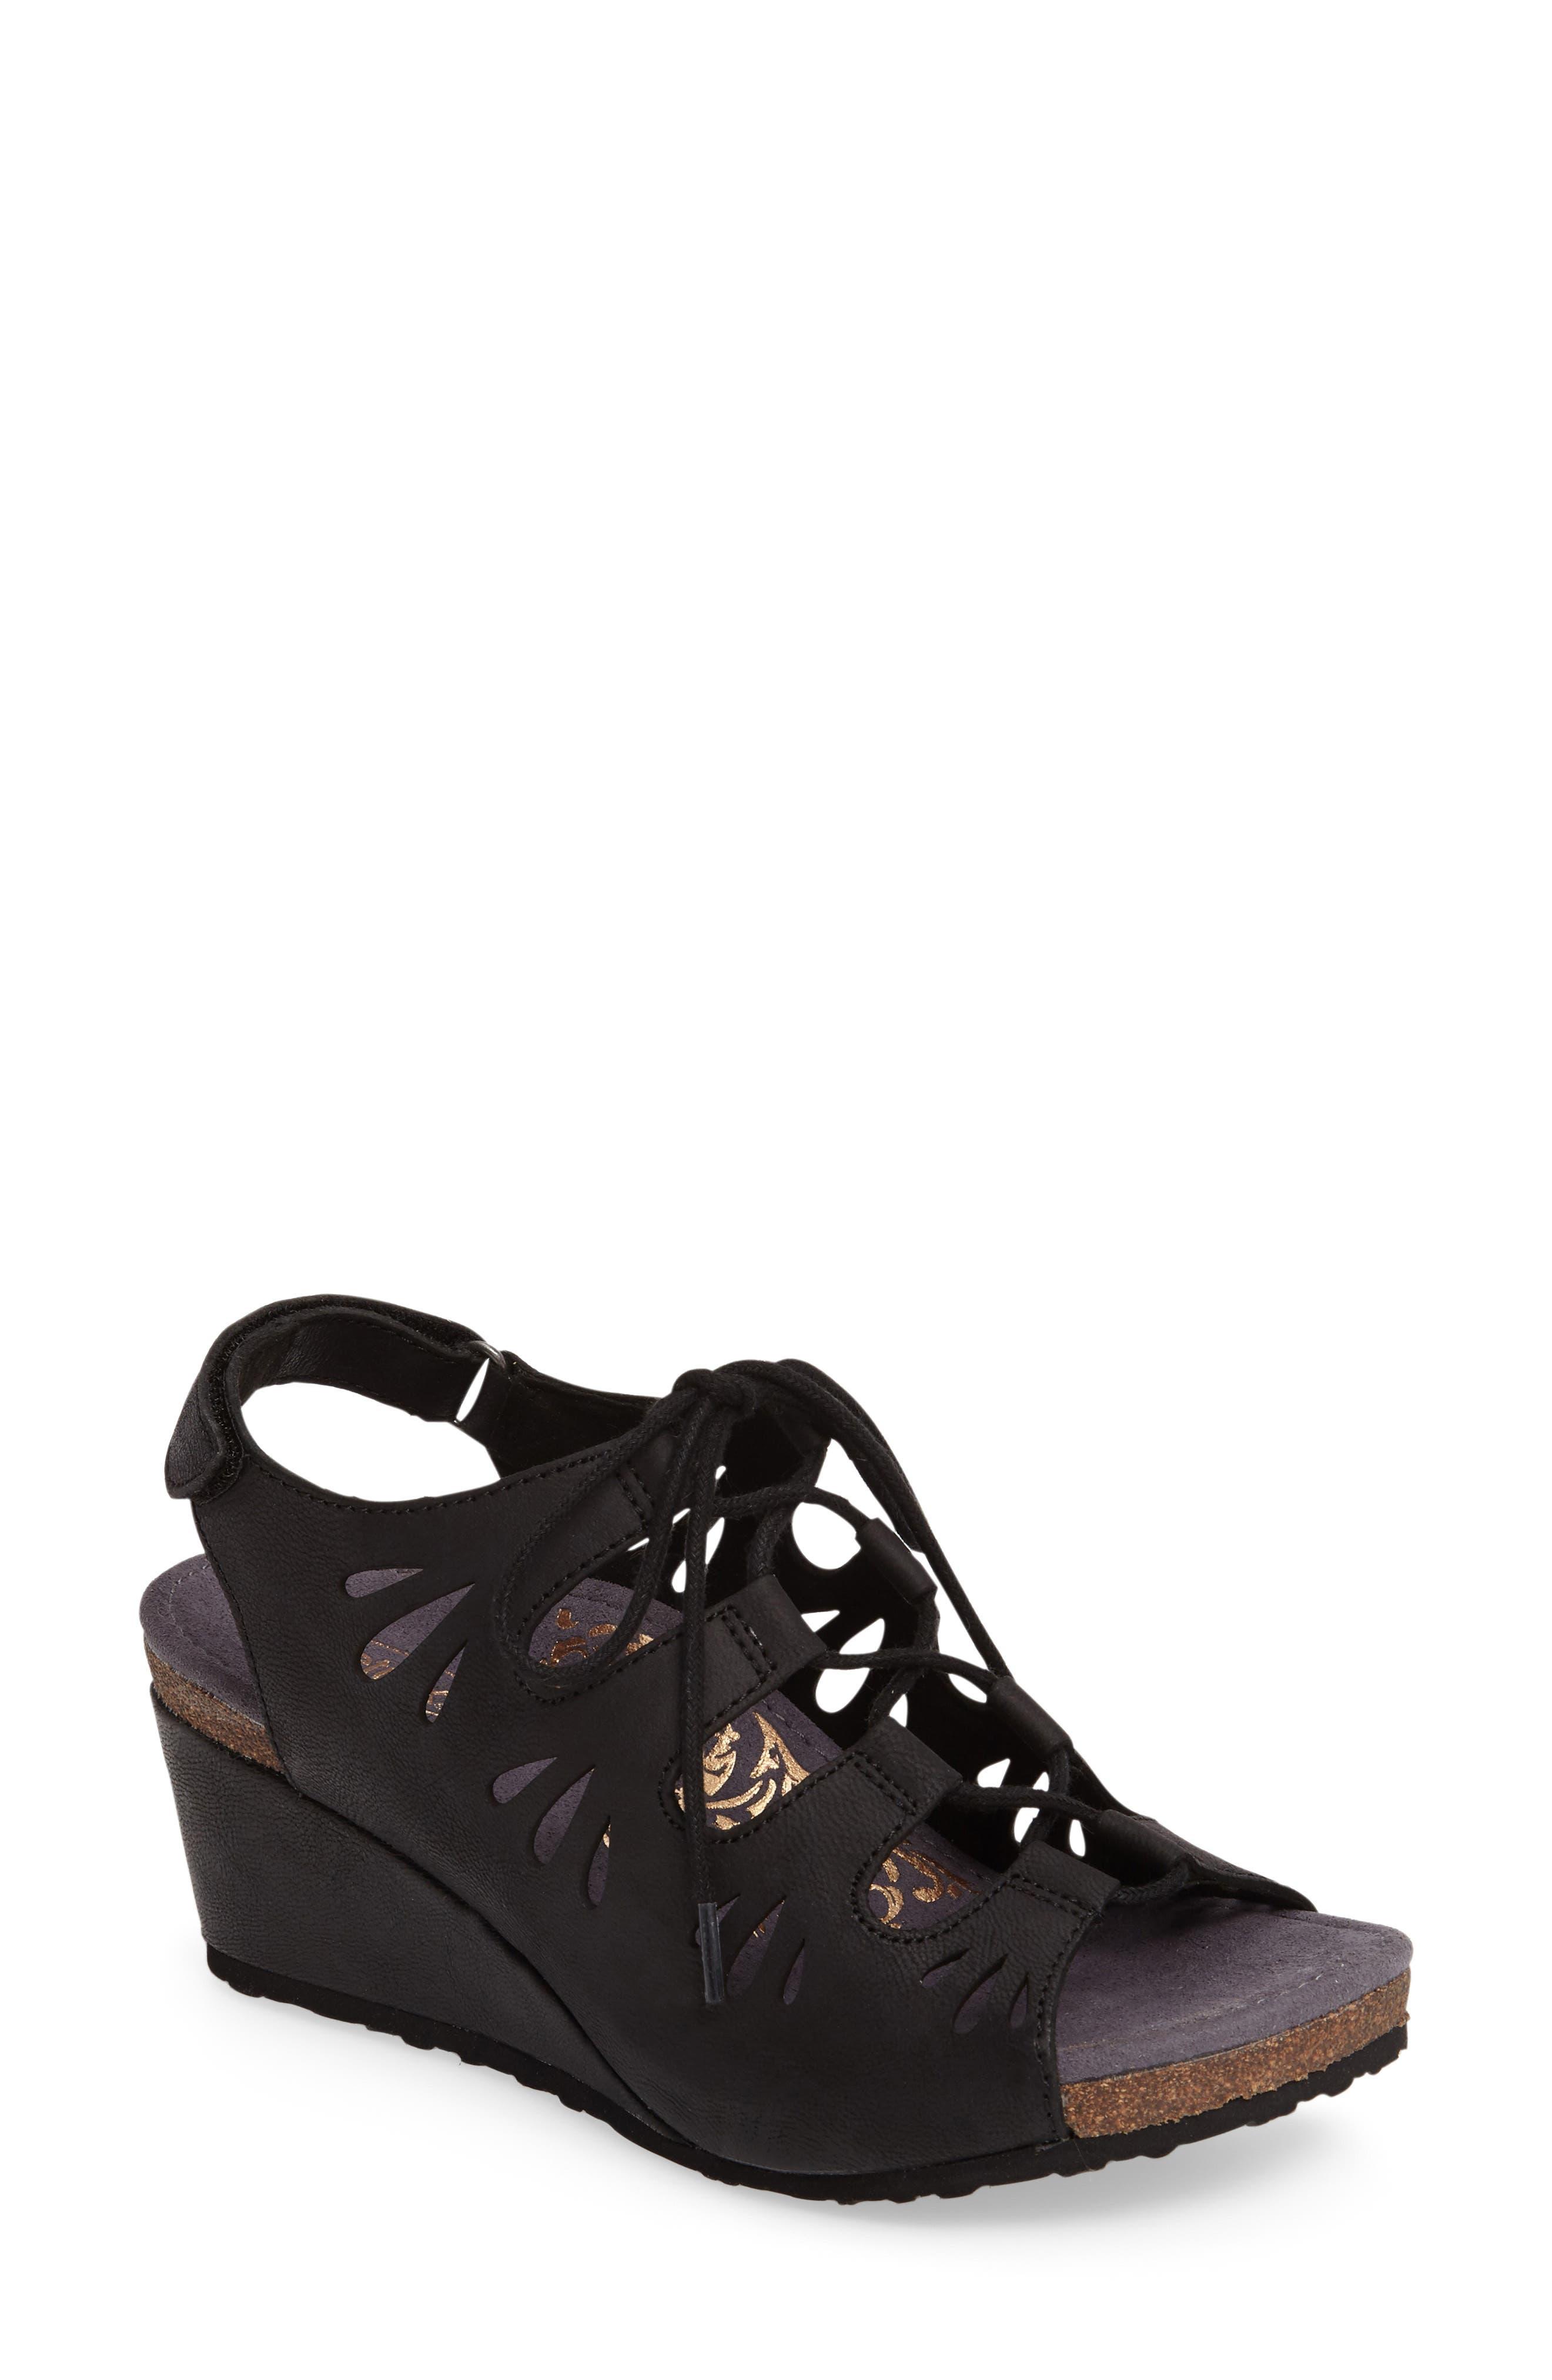 Giselle Slingback Wedge Sandal,                             Main thumbnail 1, color,                             Black Leather